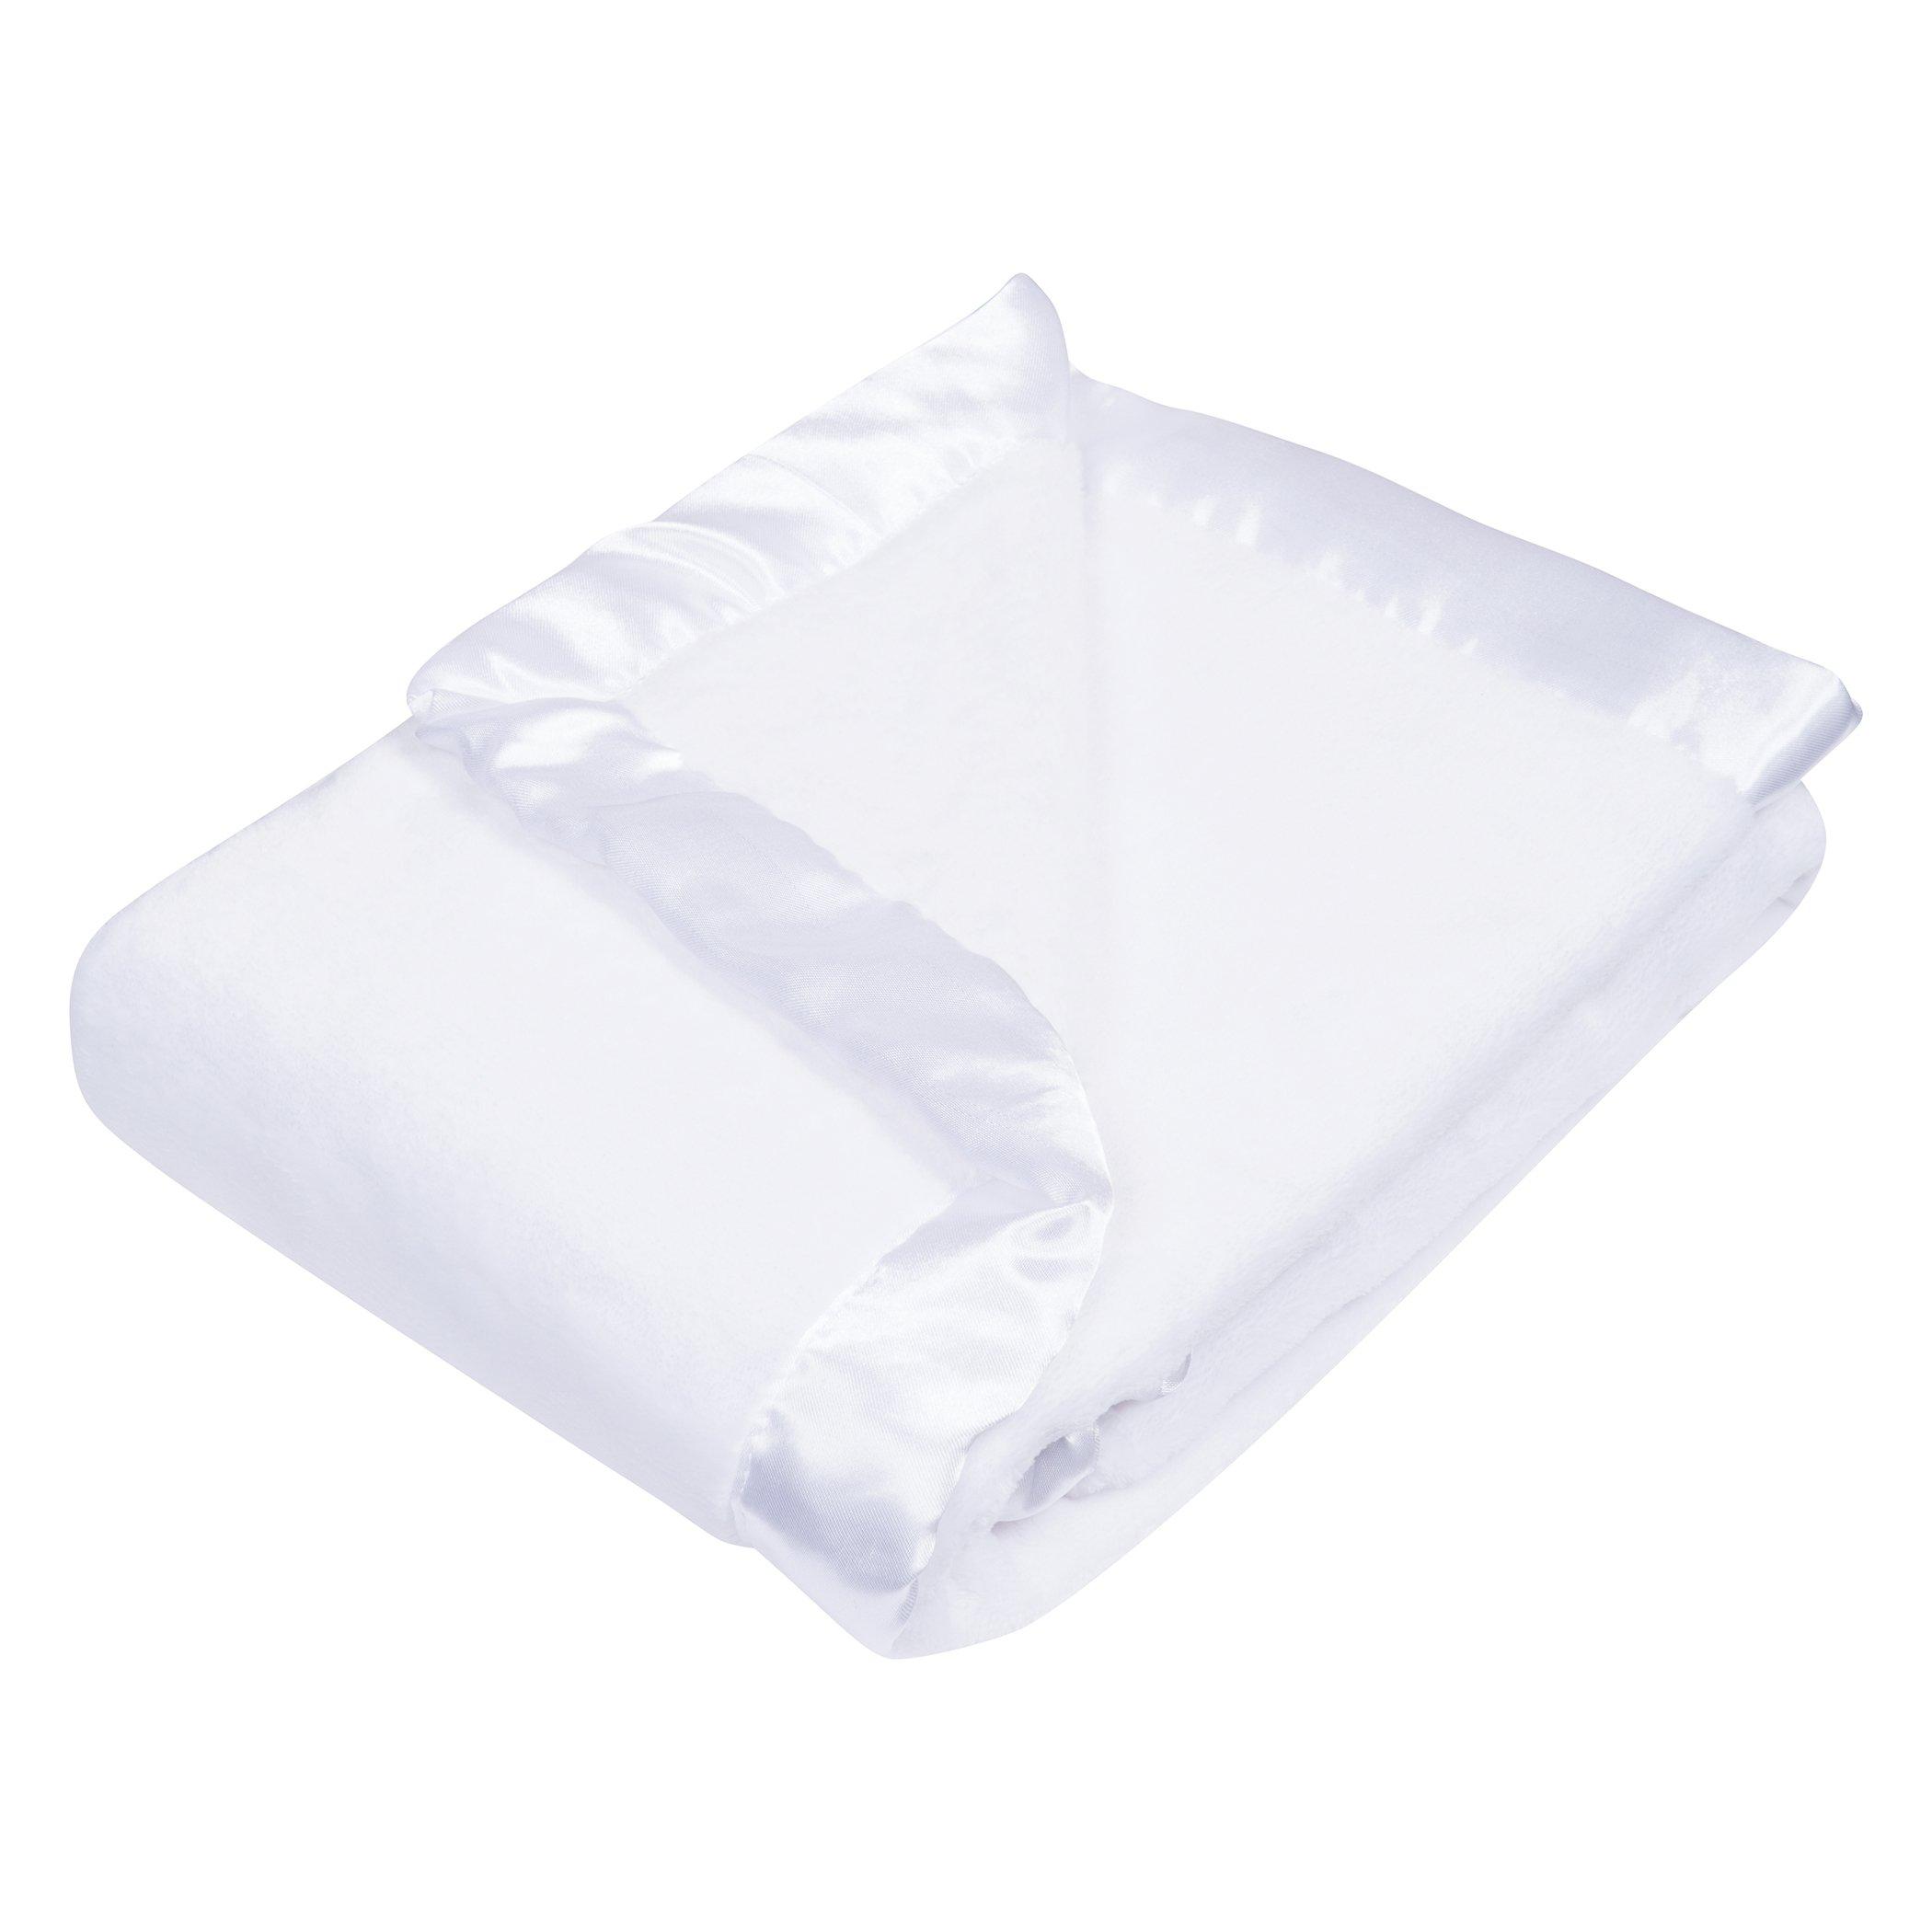 Trend Lab Plush Baby Blanket, White White